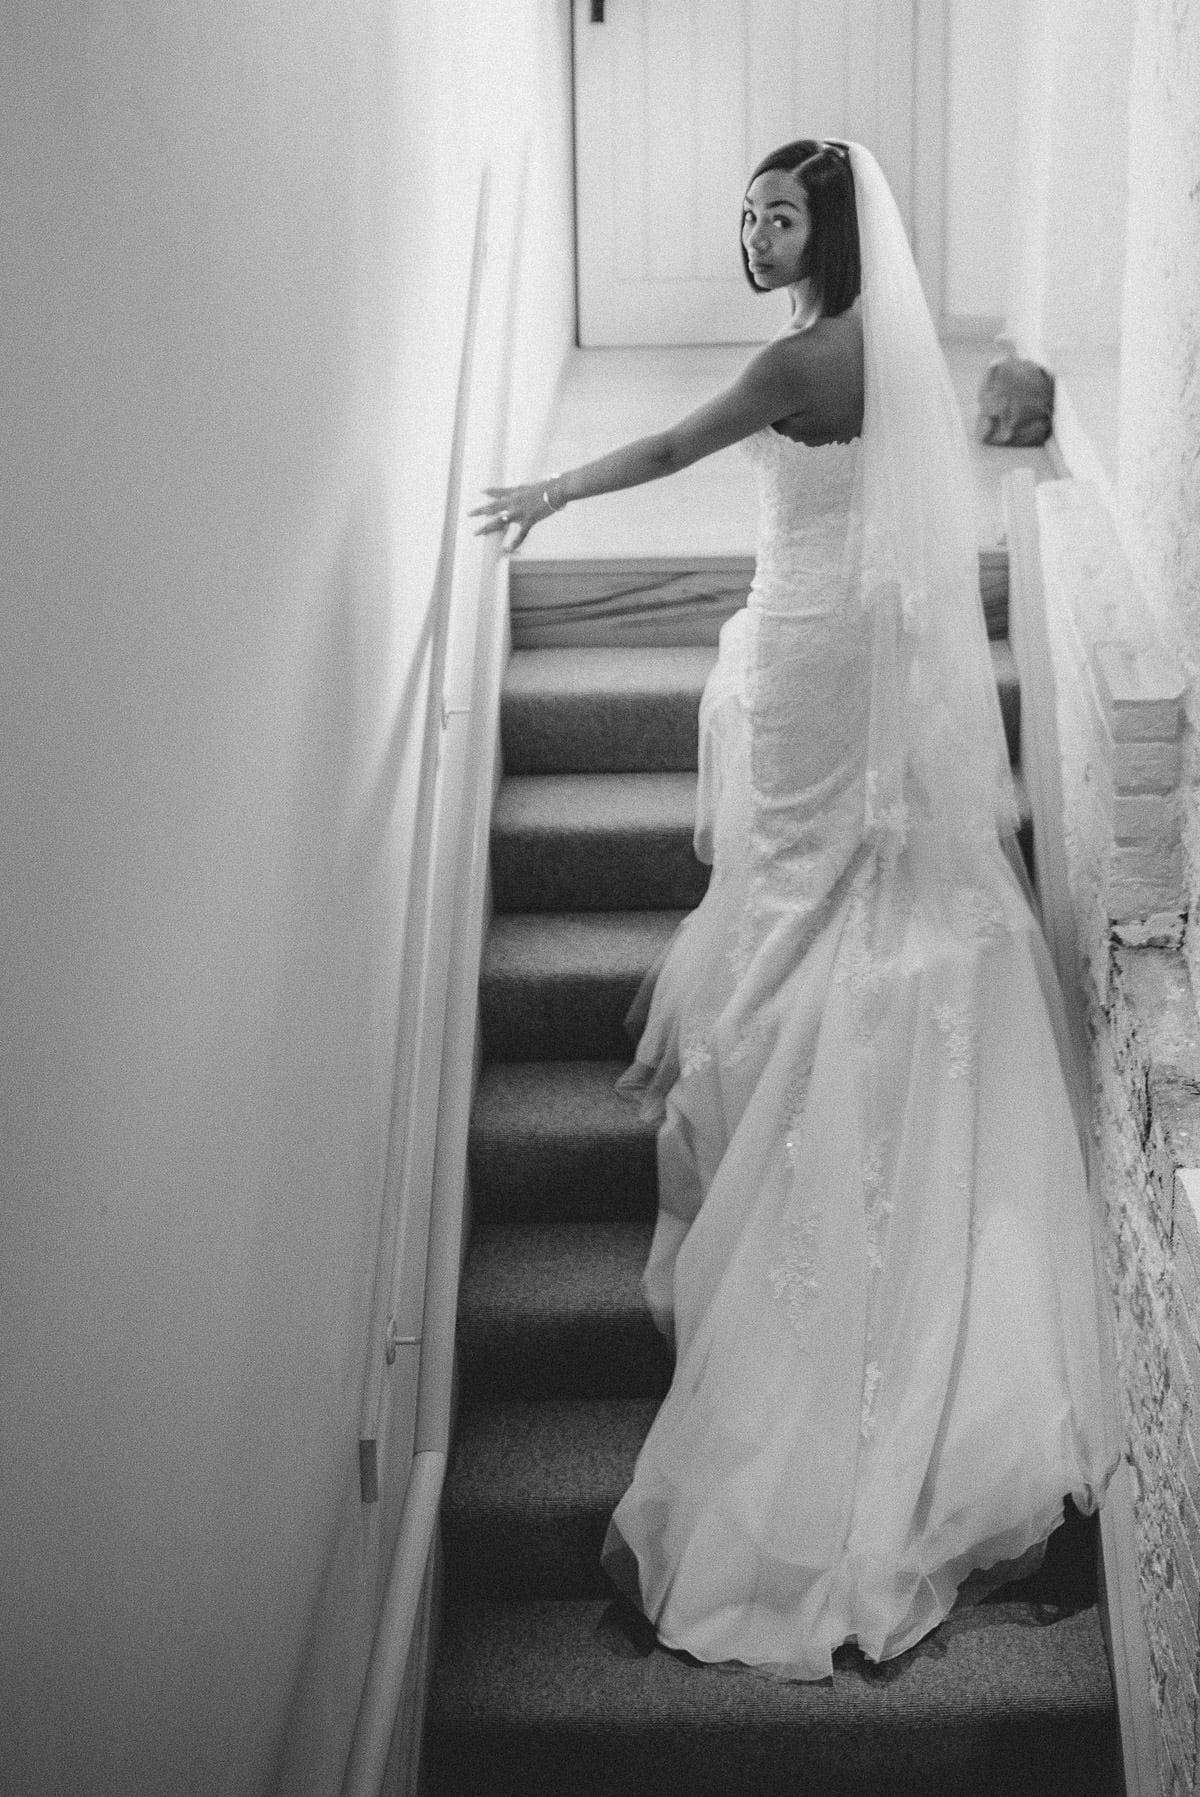 wedding-photographer-hampshire-27 23